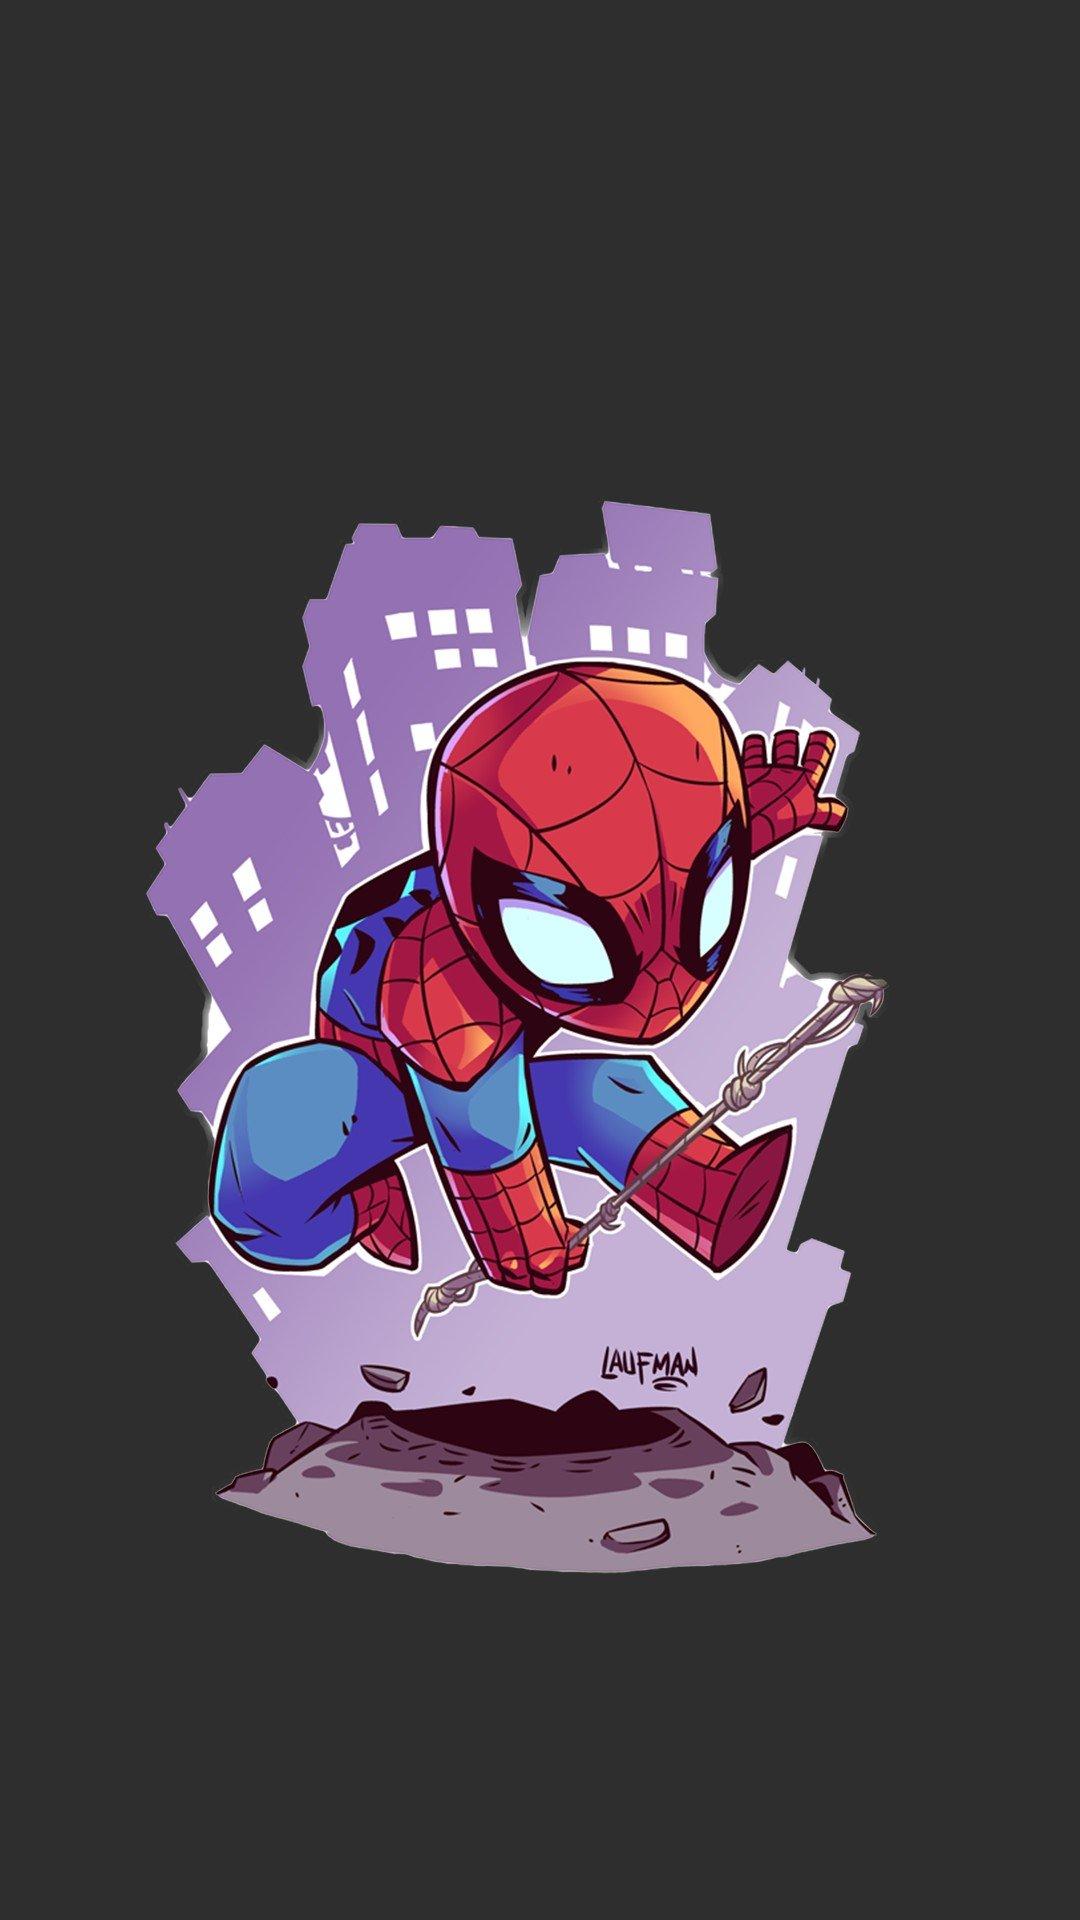 Superhero marvel comics spider man hd wallpapers - Marvel android wallpaper hd ...